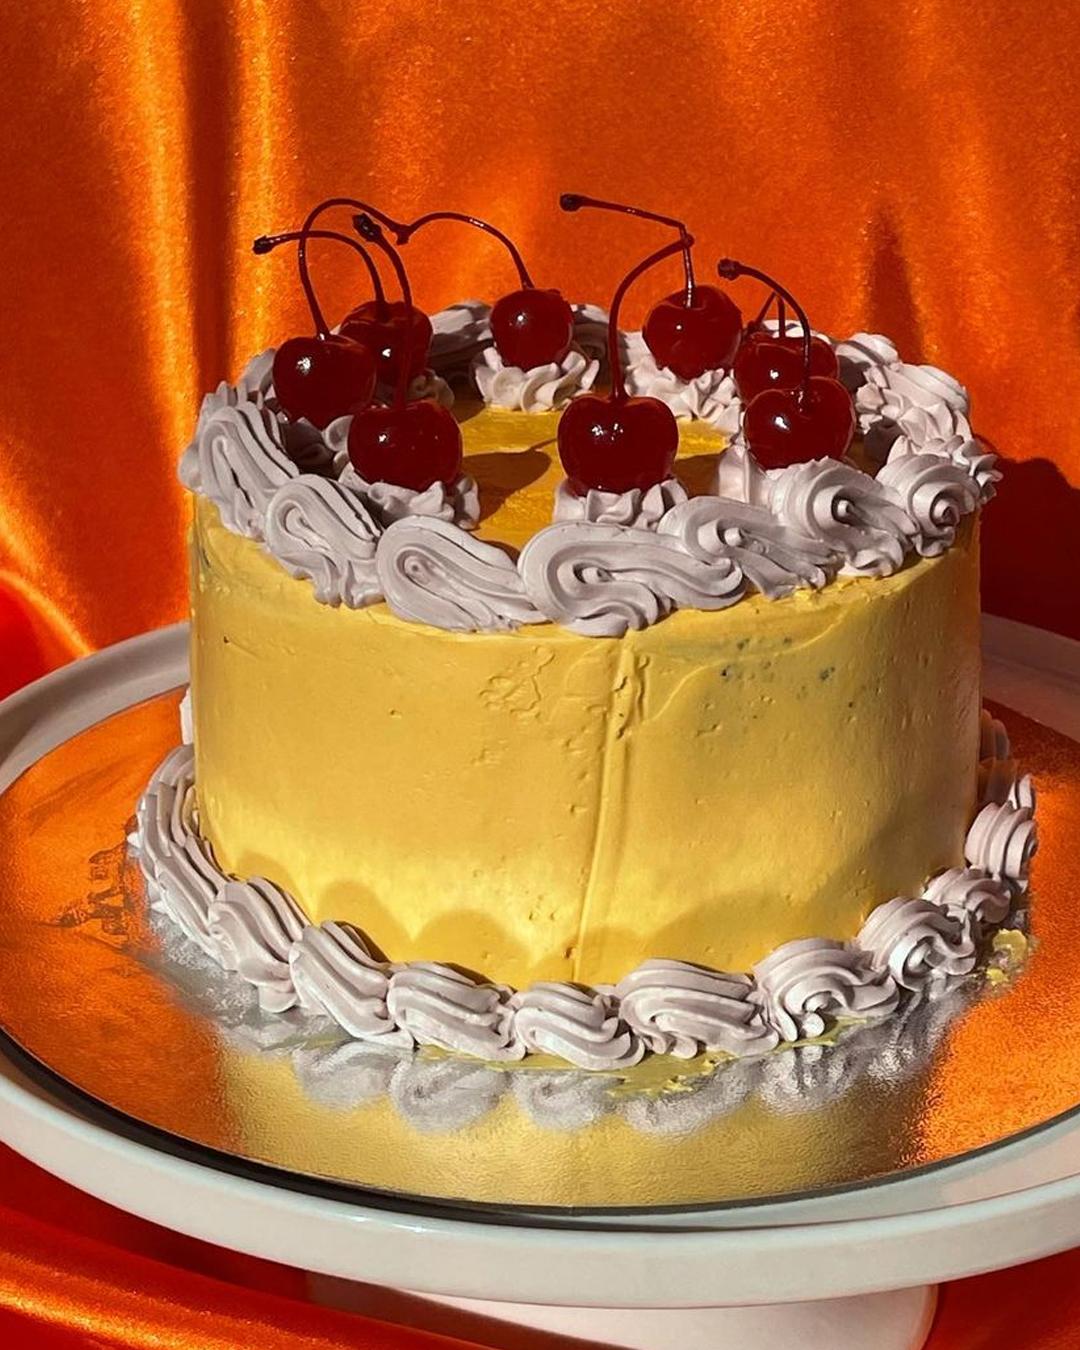 retro style cake